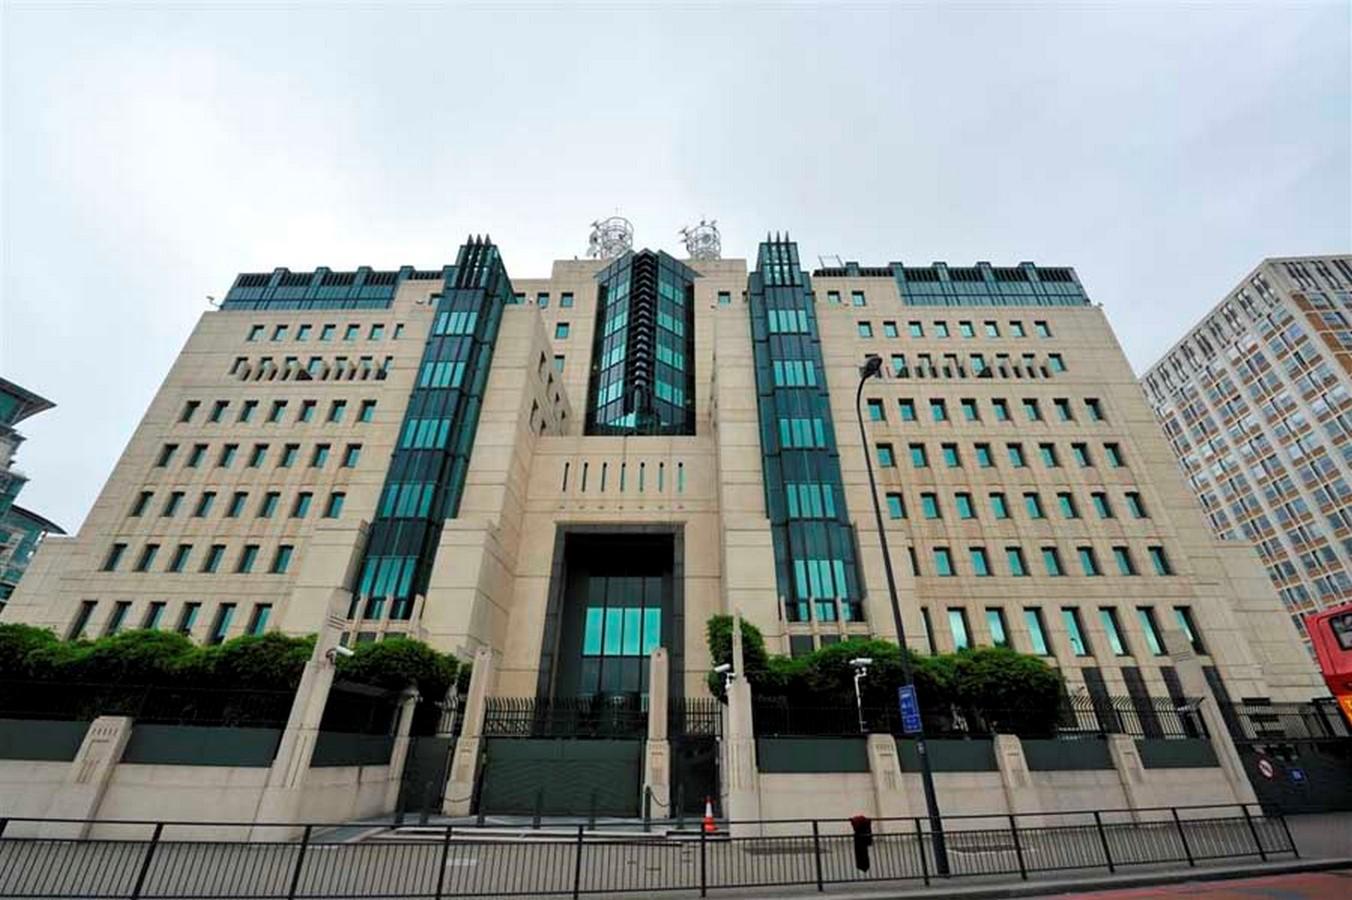 MI6 building, London, UK - SHeet2